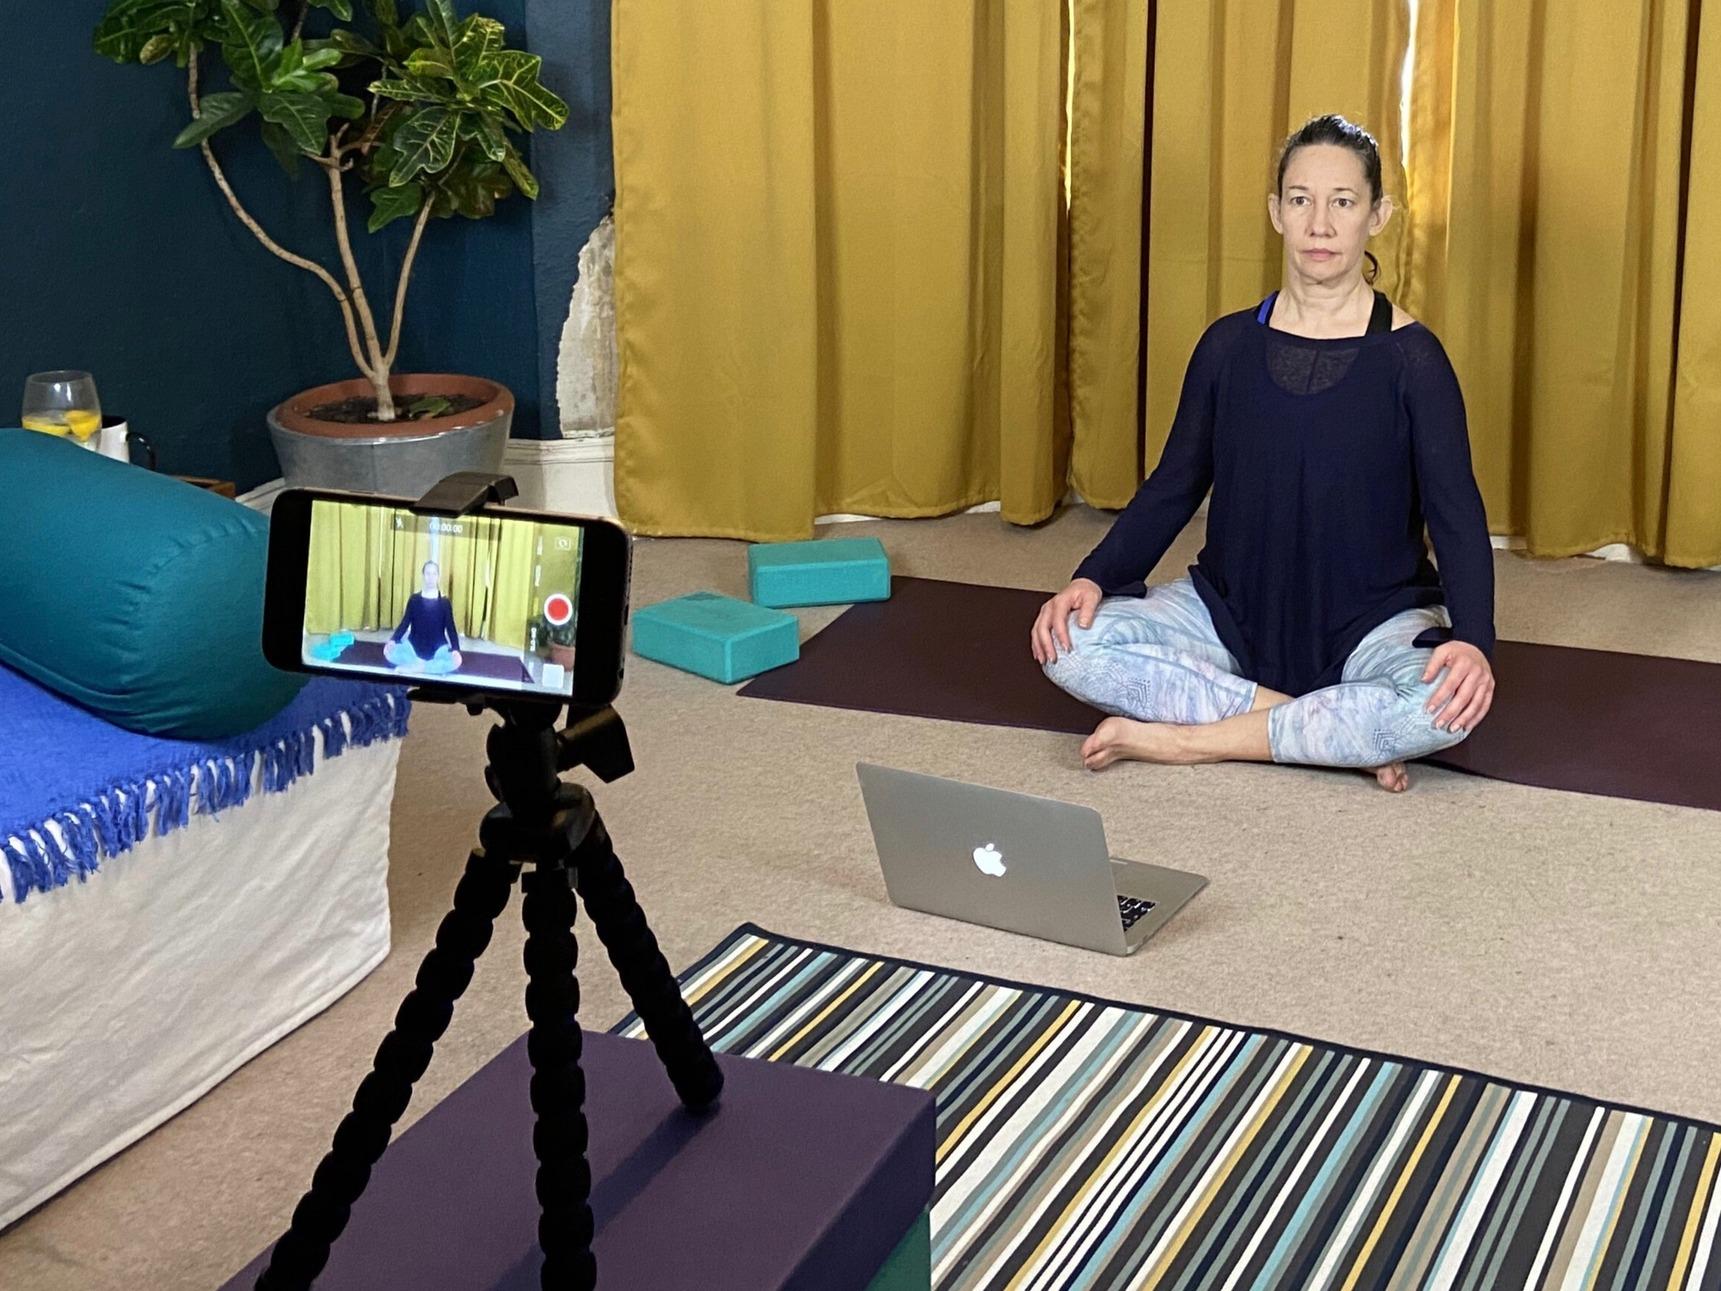 Montse Gili teaching yoga online